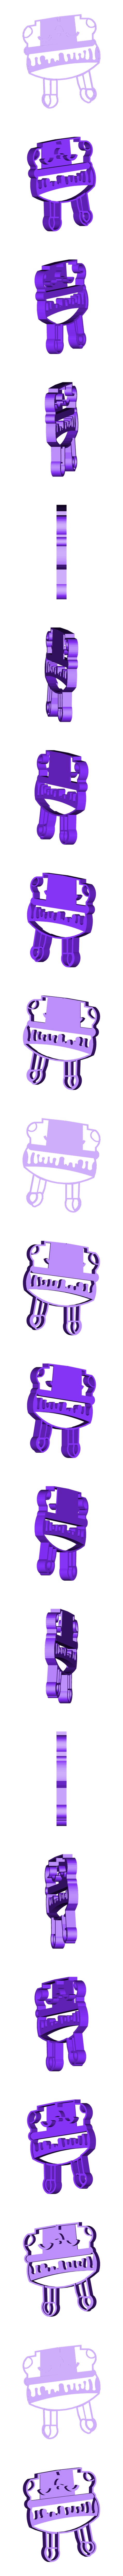 Shopkins.stl Download STL file cookie cutter shopkins, cookie cutter • 3D print design, catoiraf